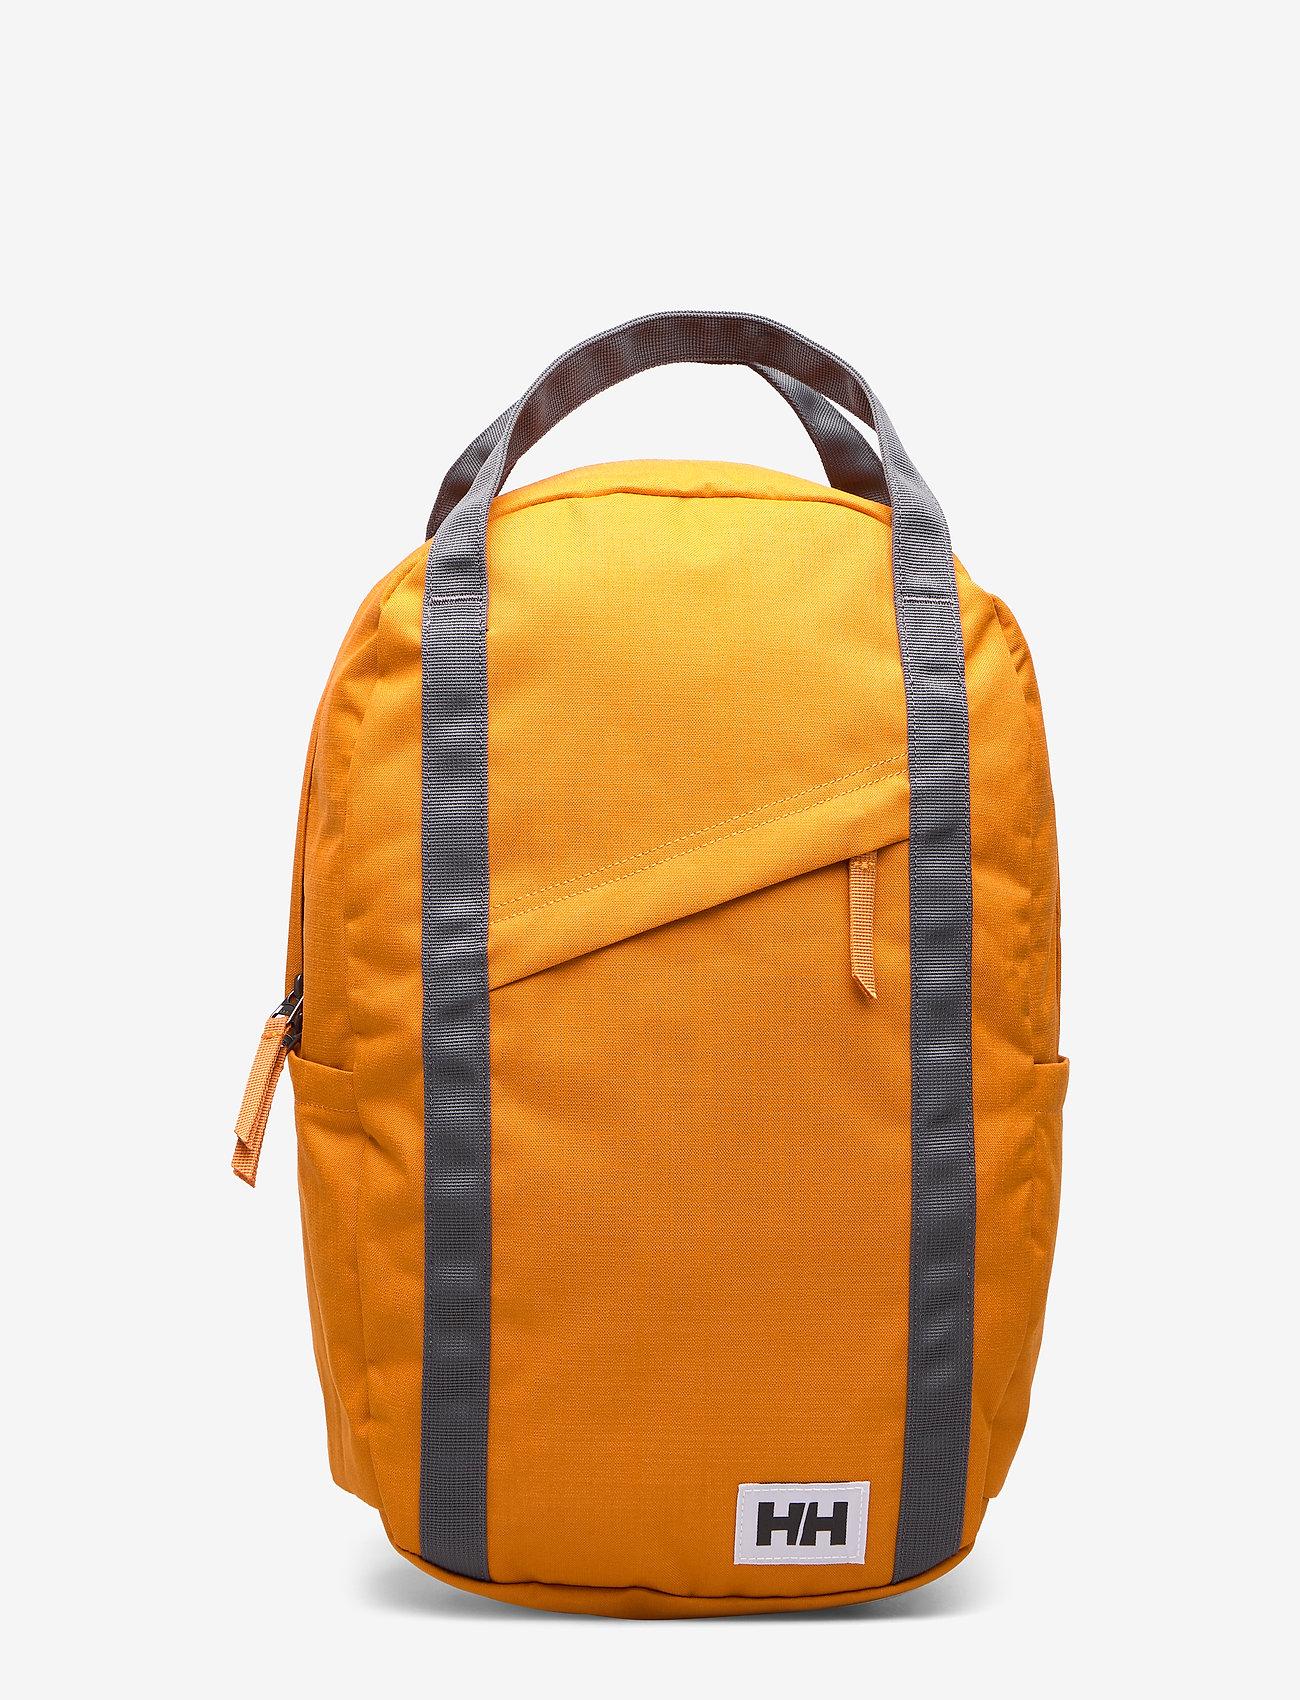 Helly Hansen - OSLO BACKPACK - torby treningowe - marmalade - 0